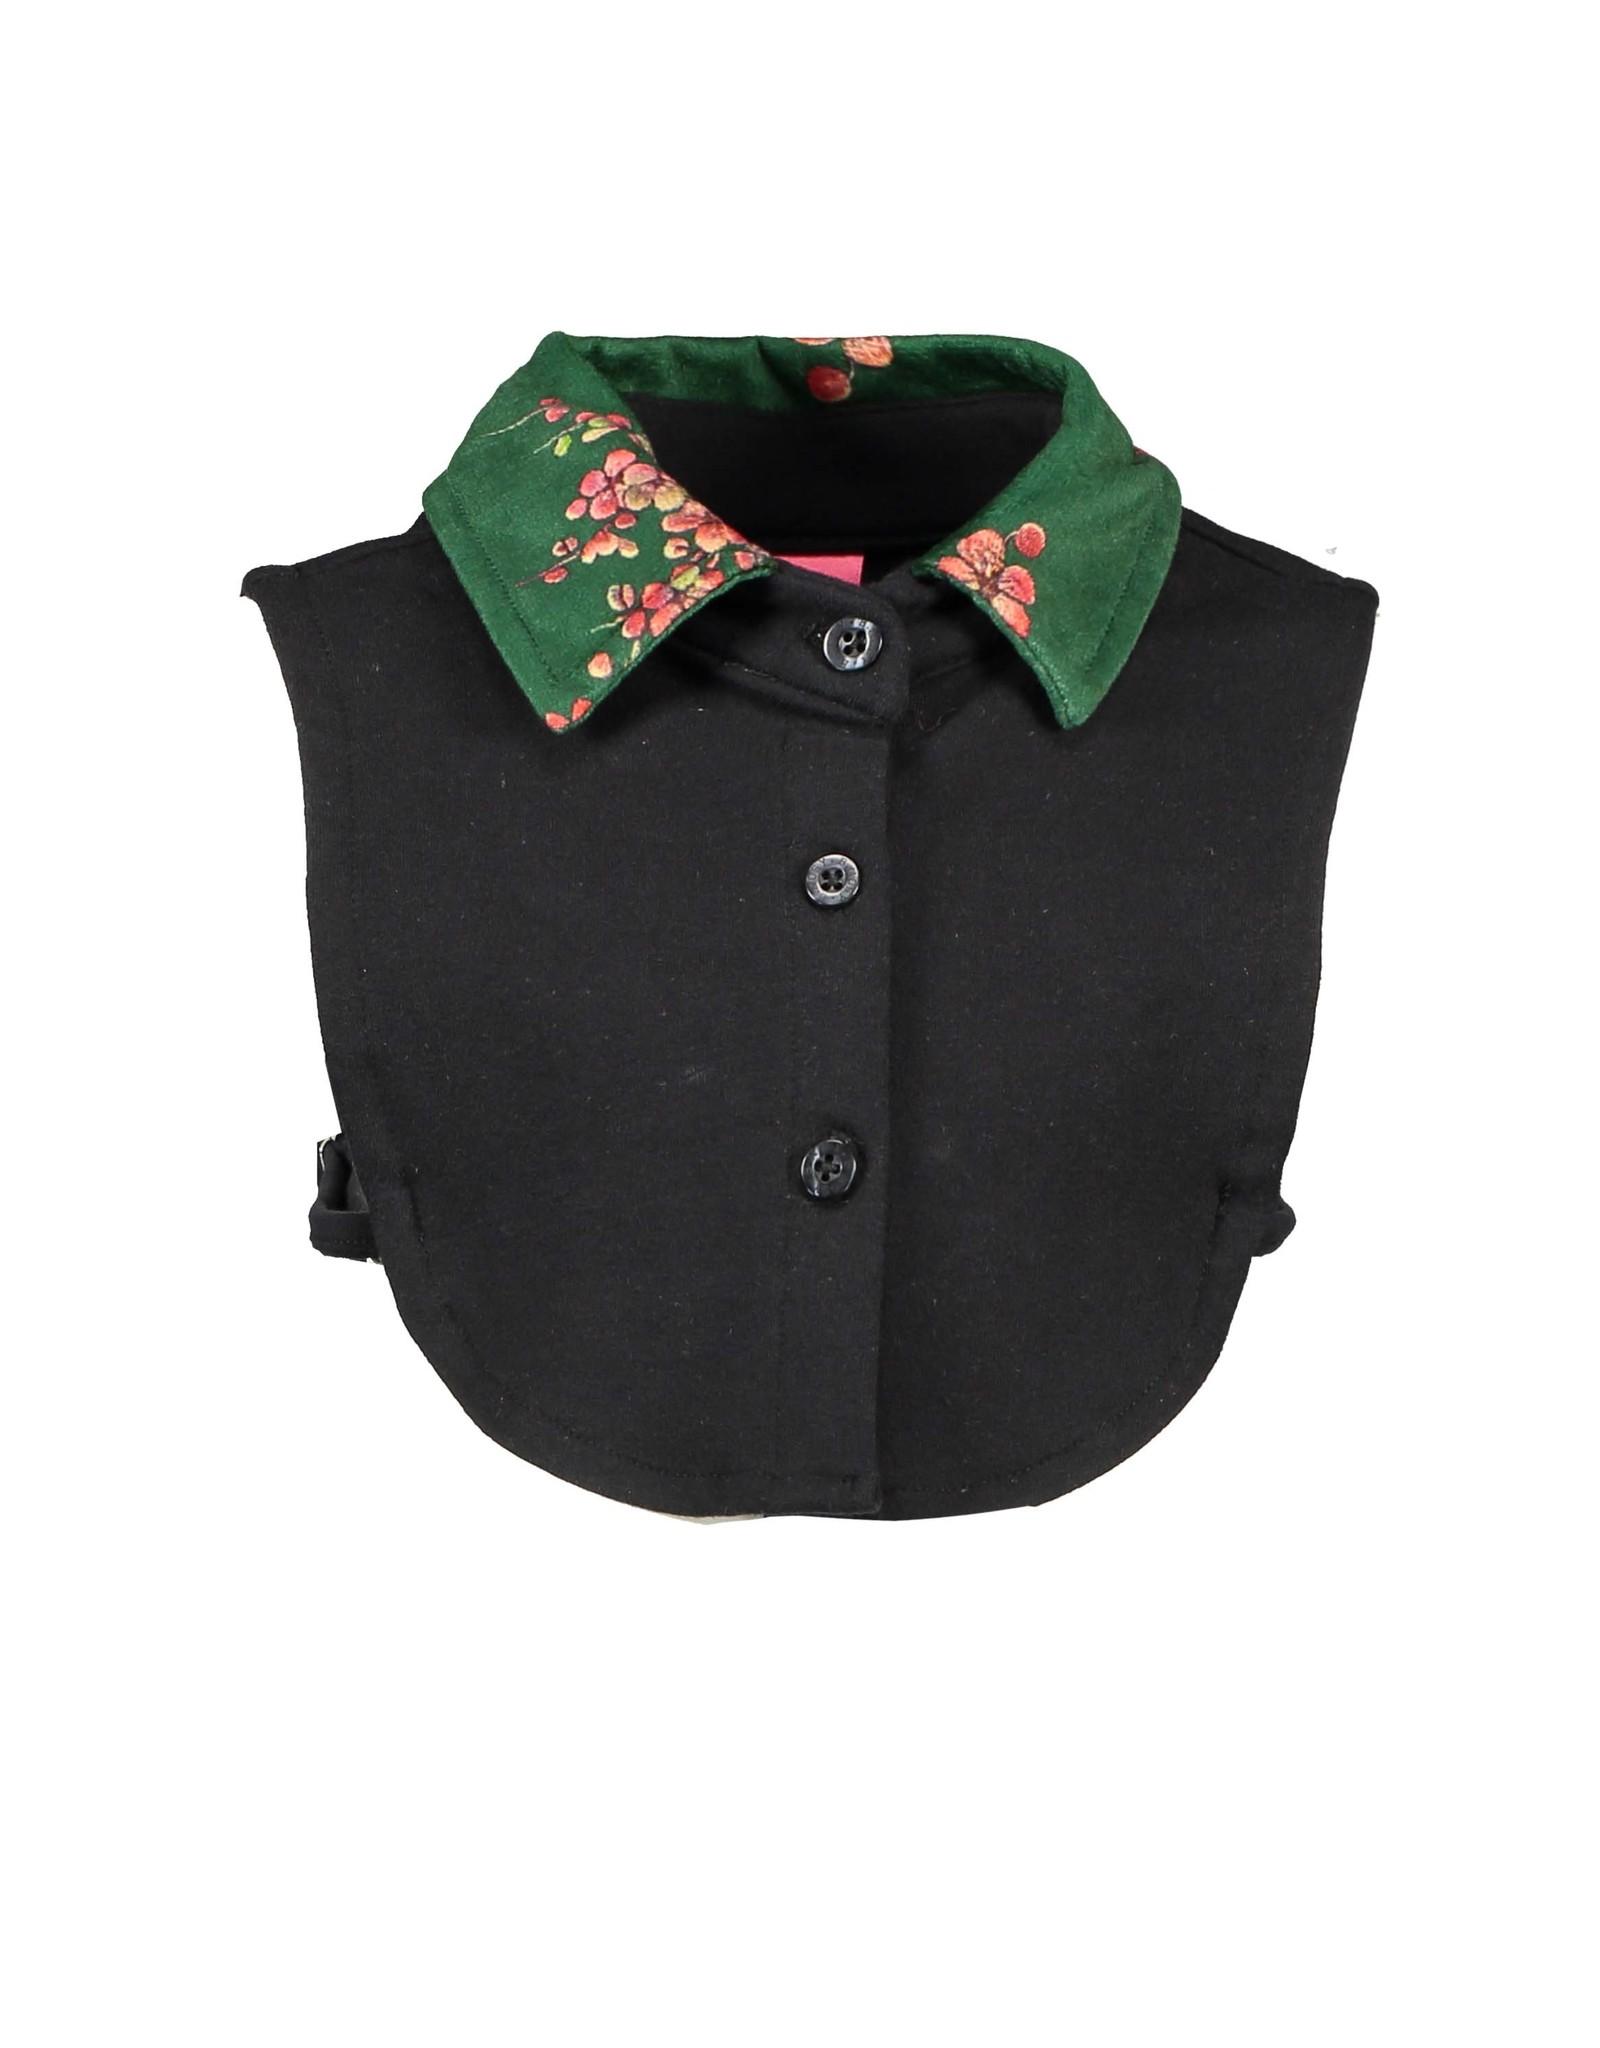 B.Nosy B.Nosy Girls Collar with printed velours Black